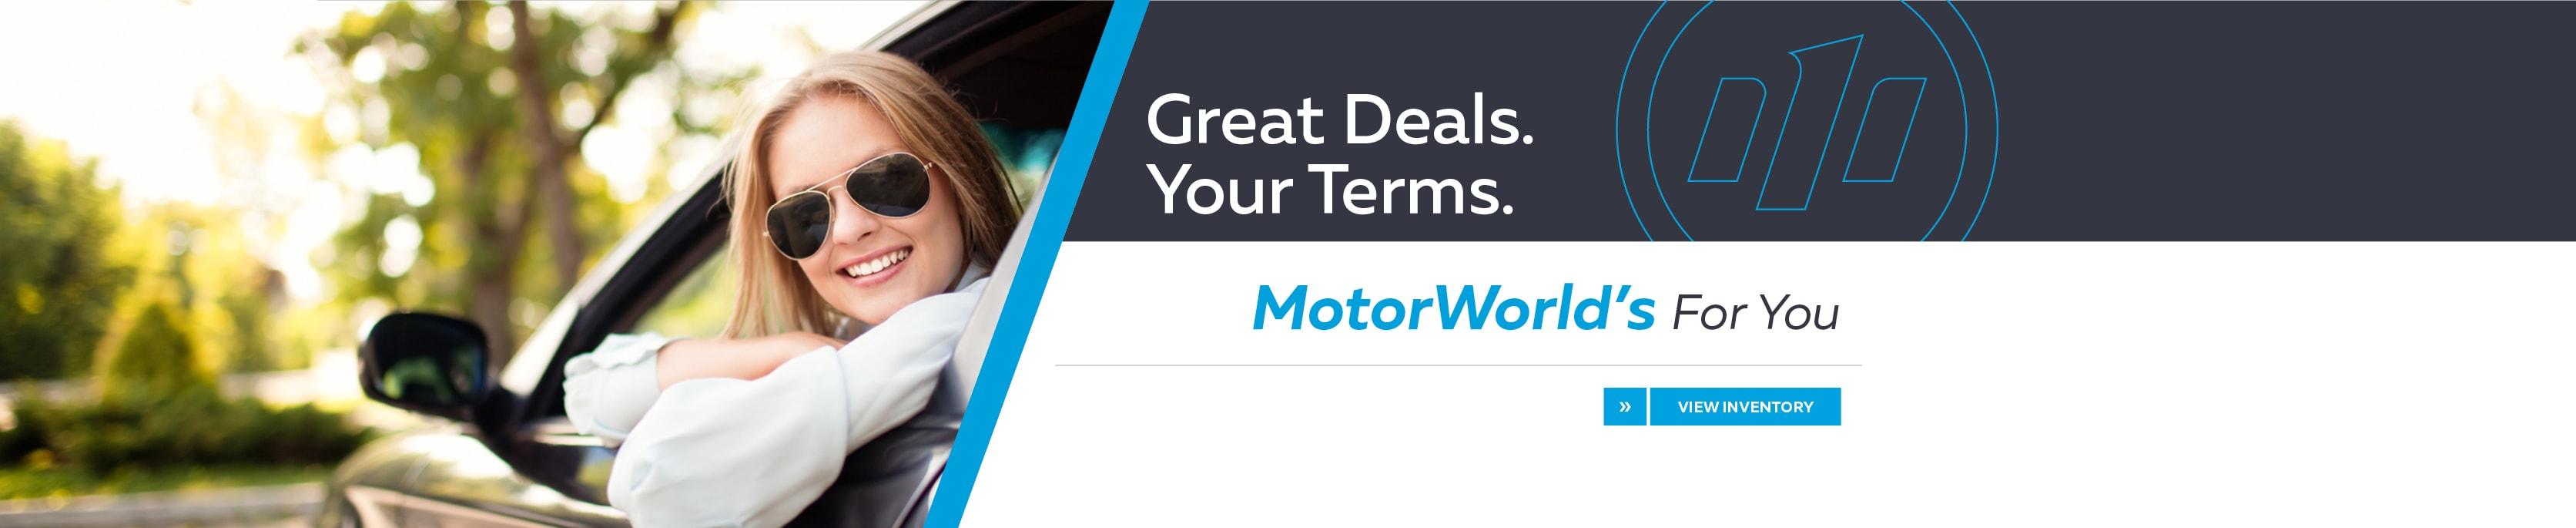 MotorWorld Mile e Autogroup